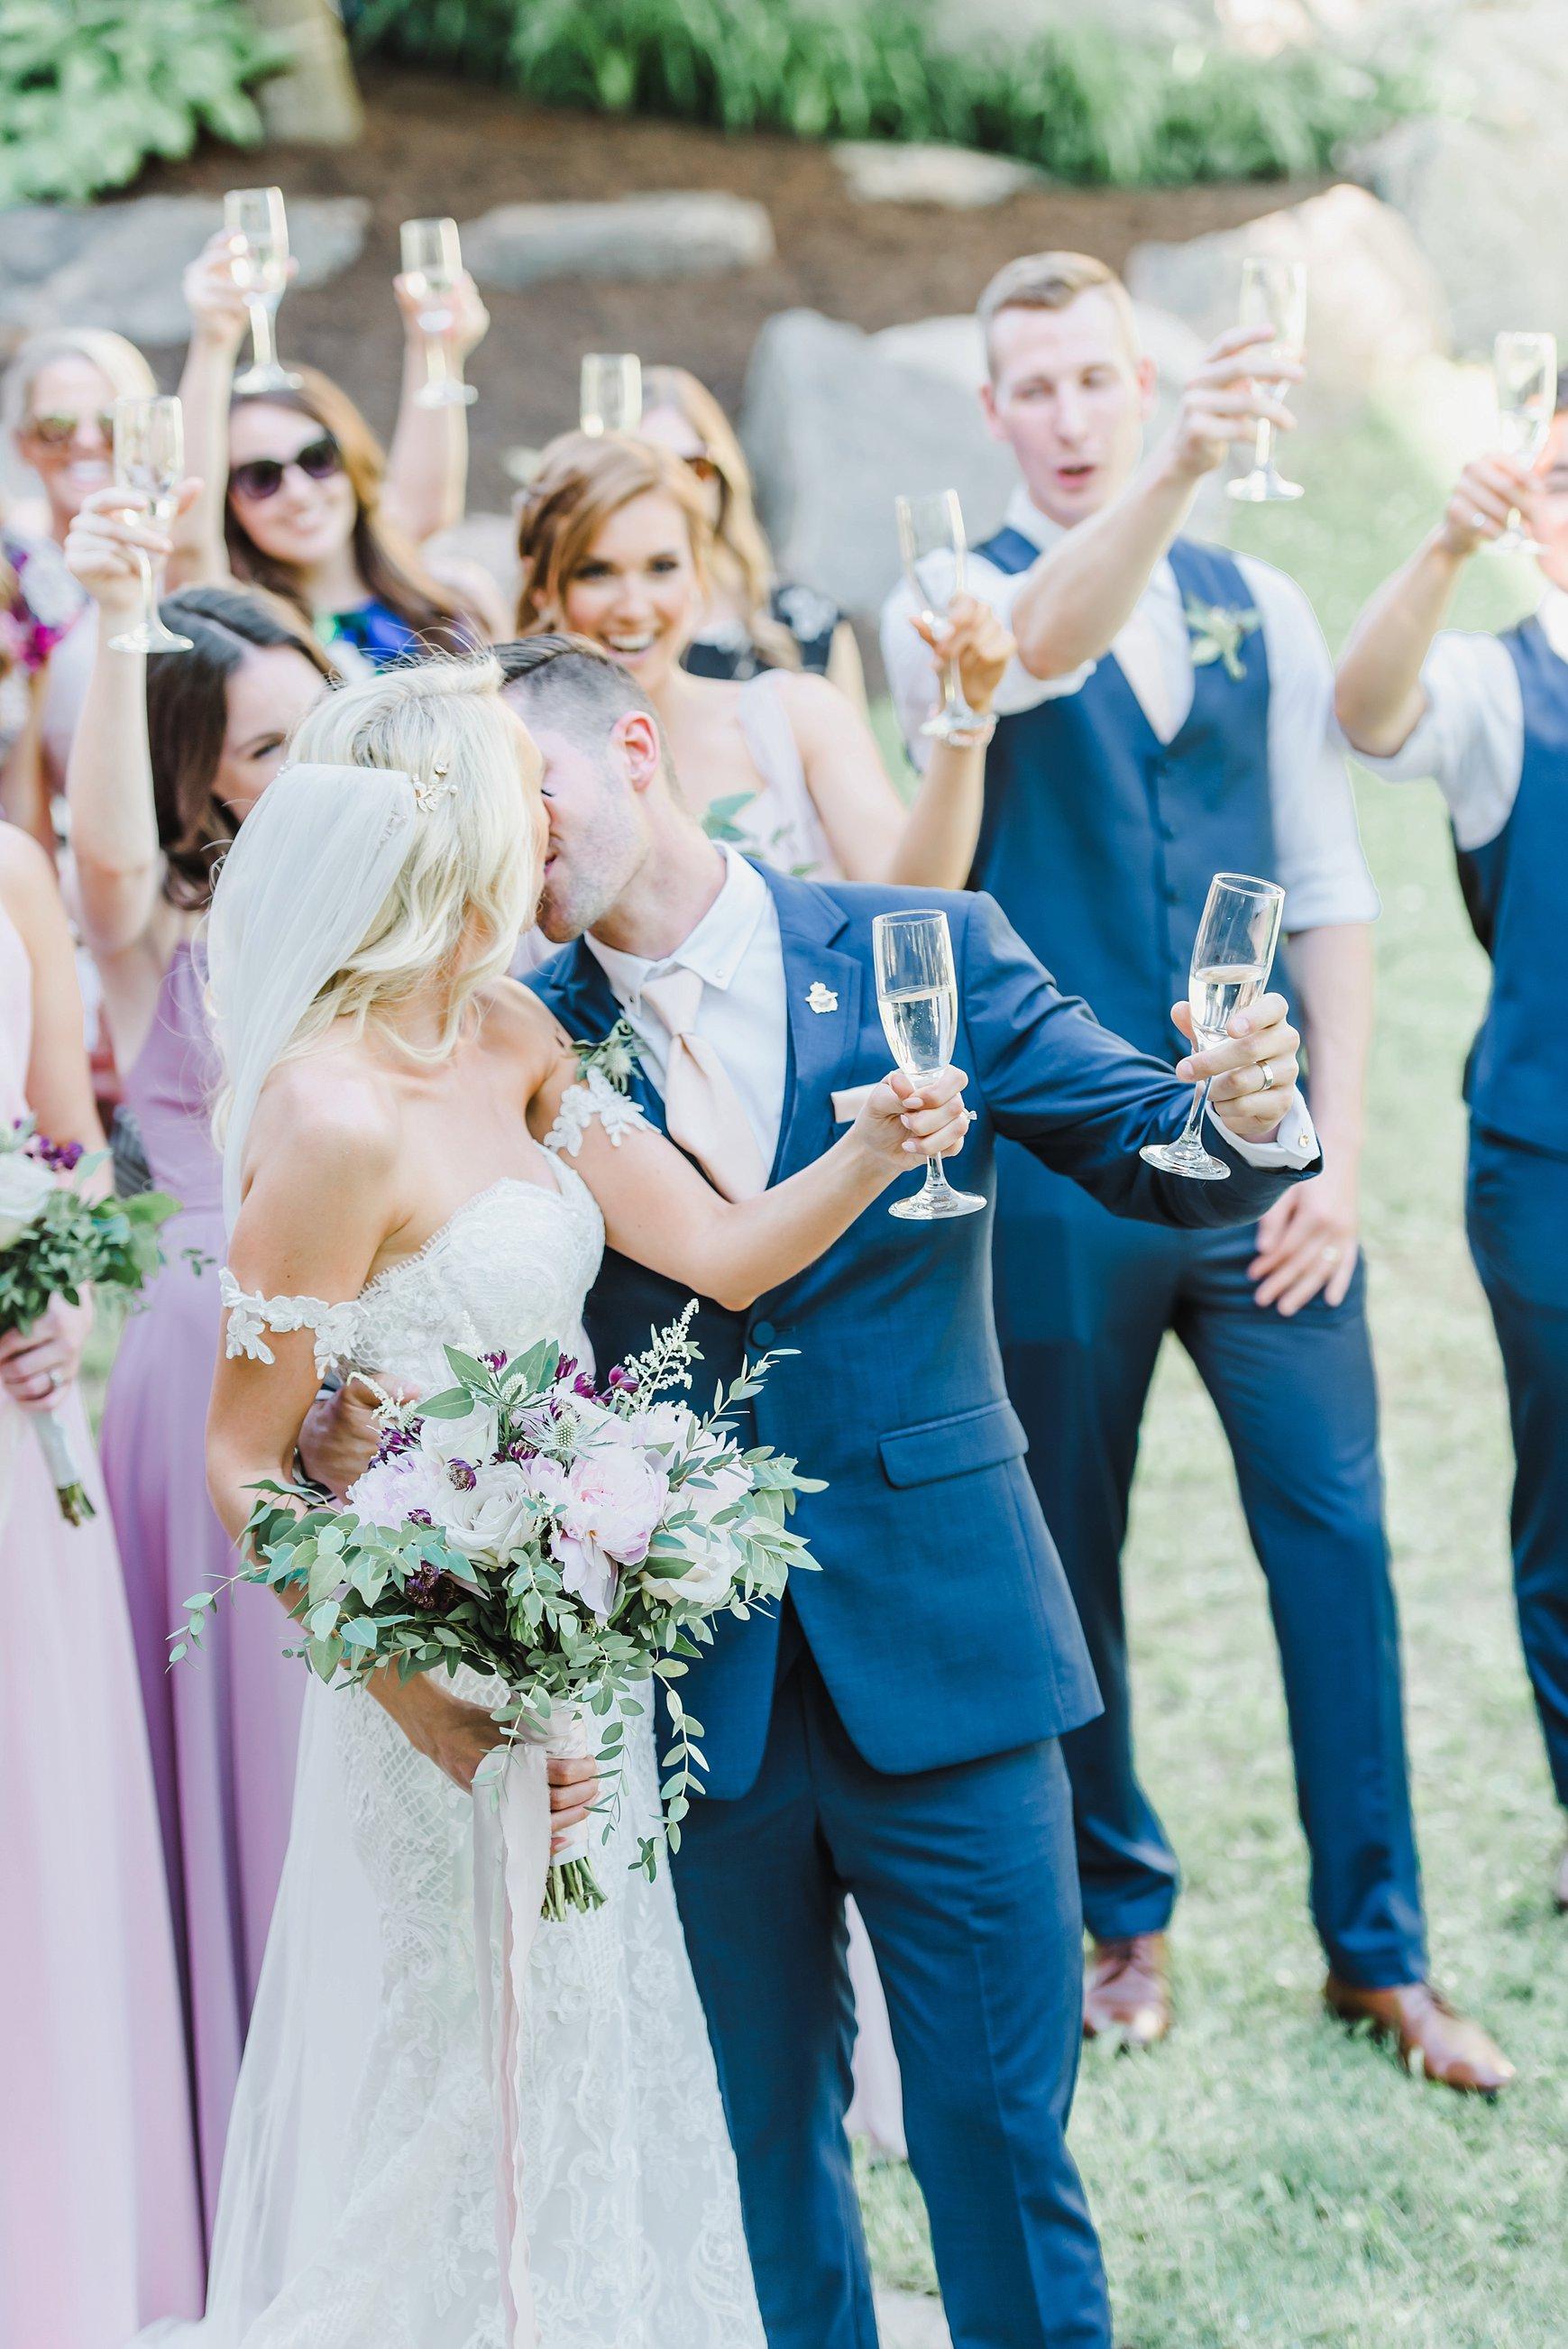 light airy indie fine art ottawa wedding photographer | Ali and Batoul Photography_0073.jpg